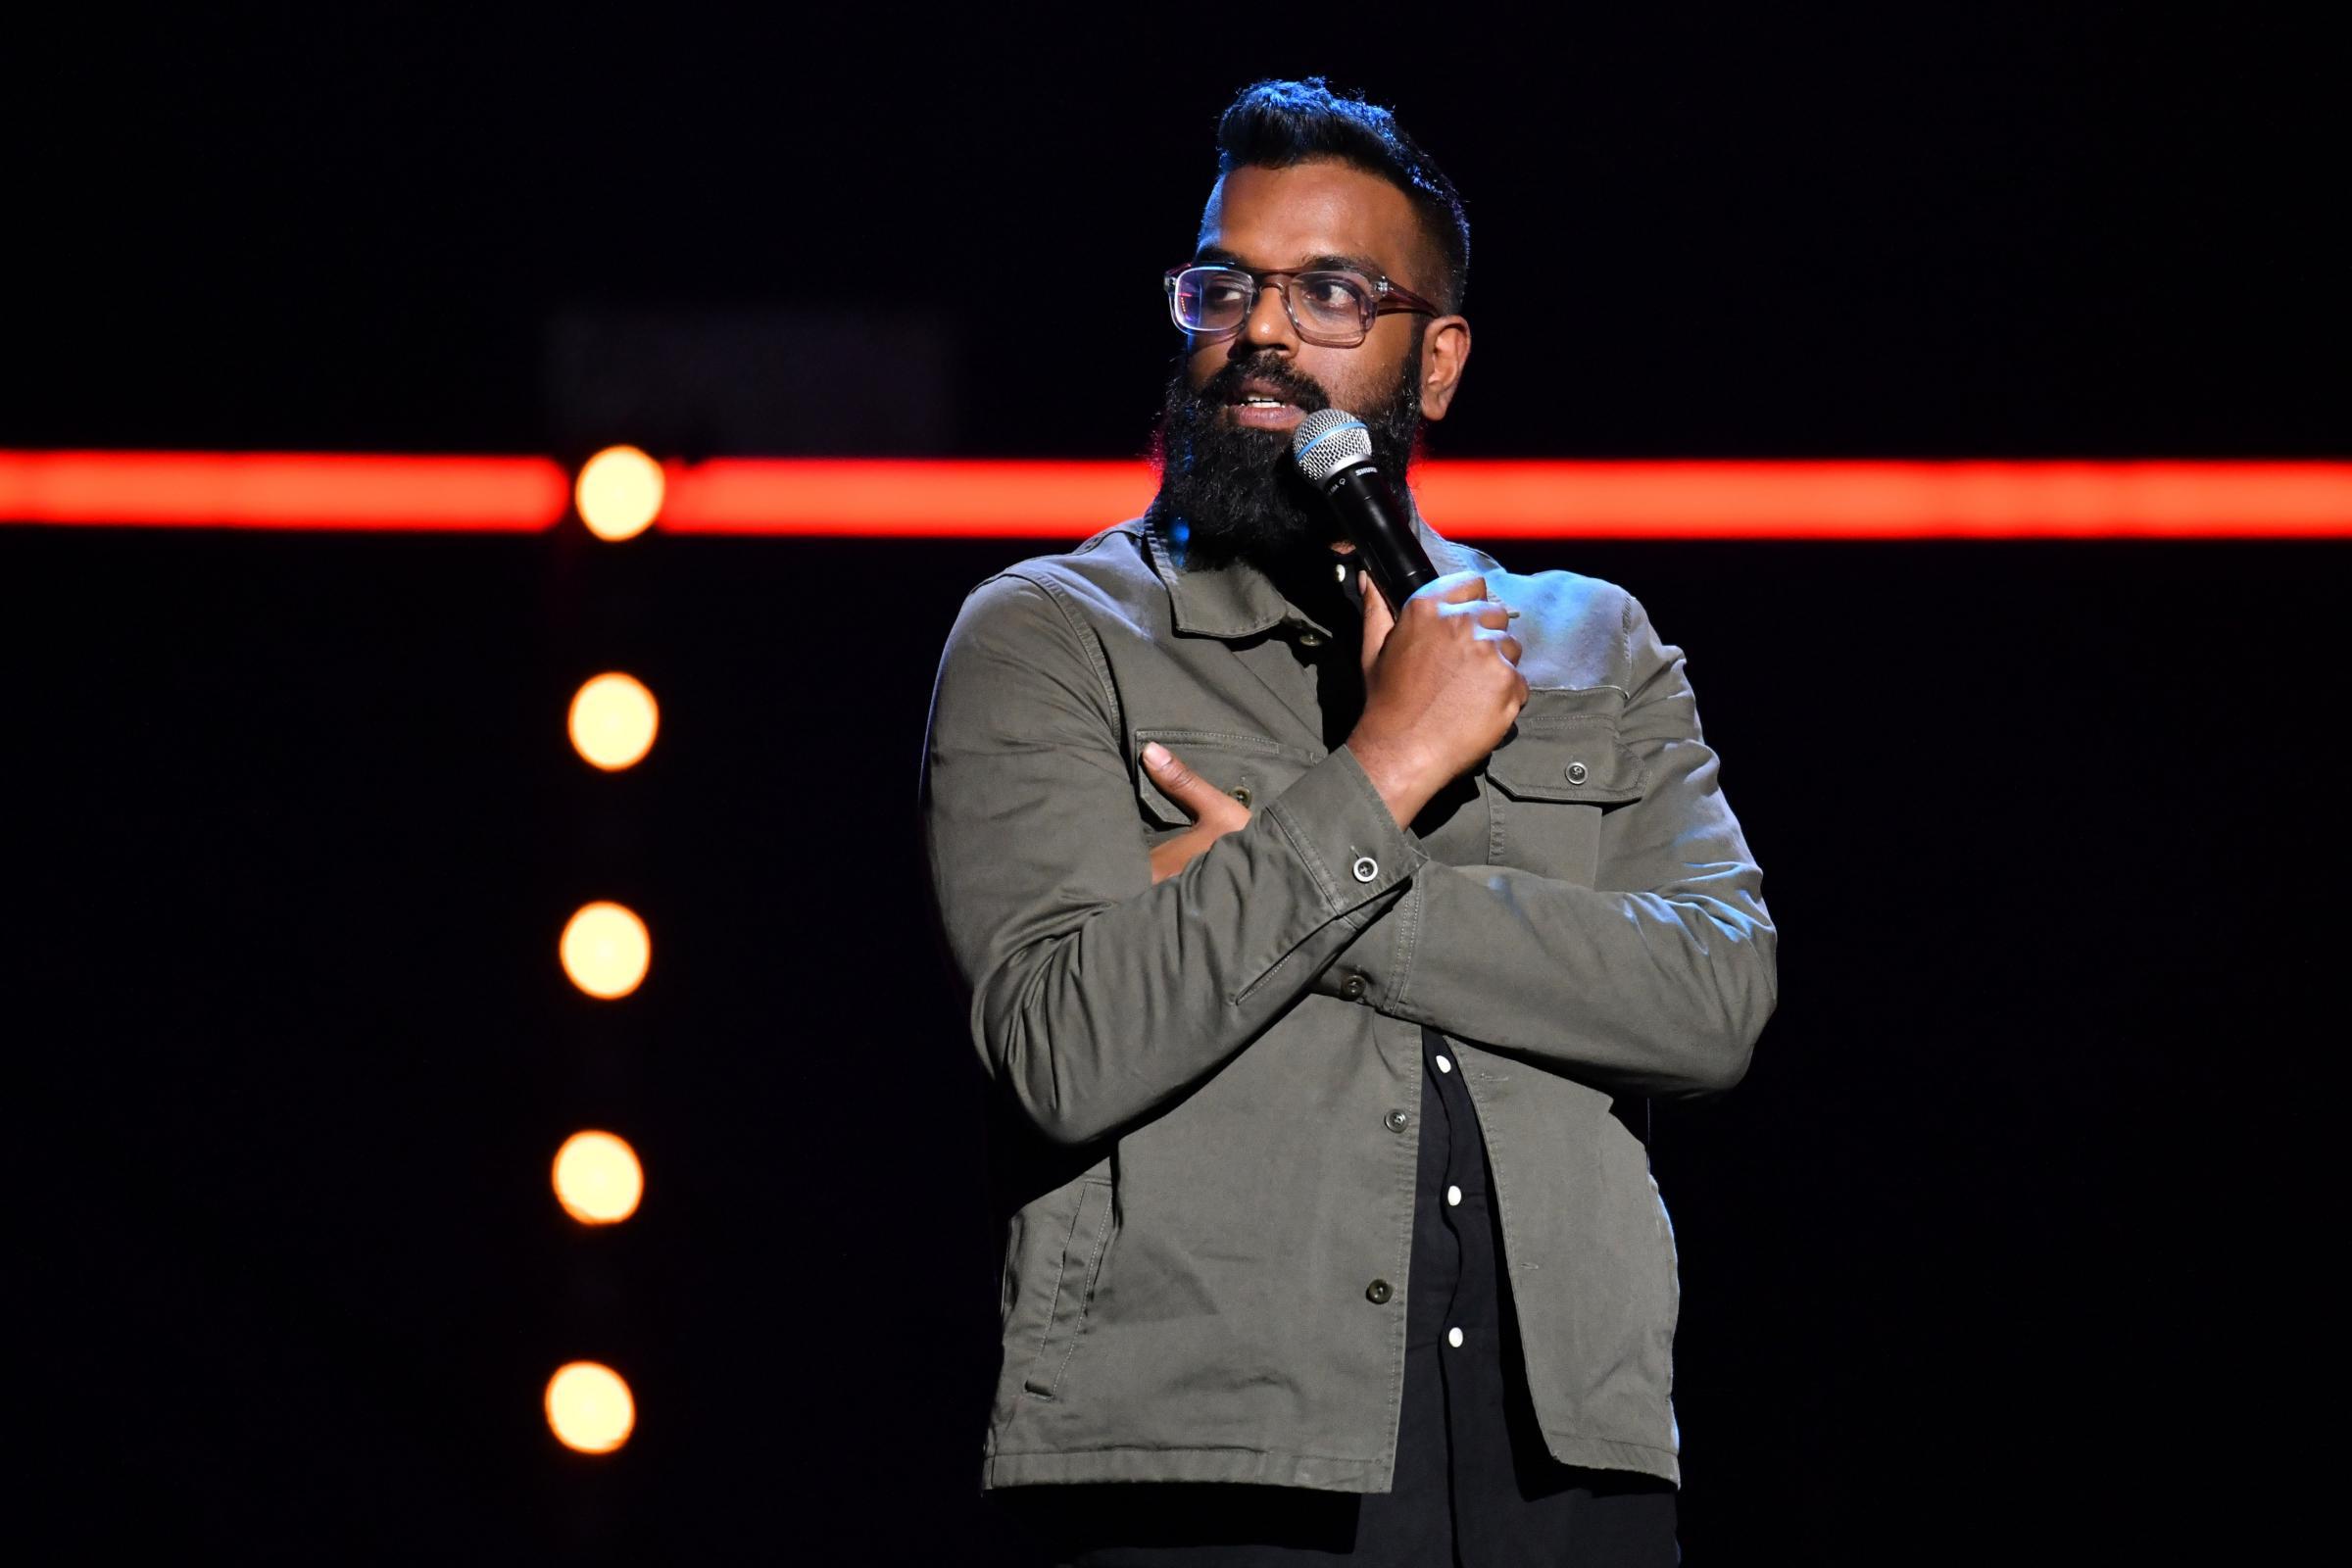 Romesh Ranganathan marks milestone as he co-hosts Royal Variety Performance - Dudley News